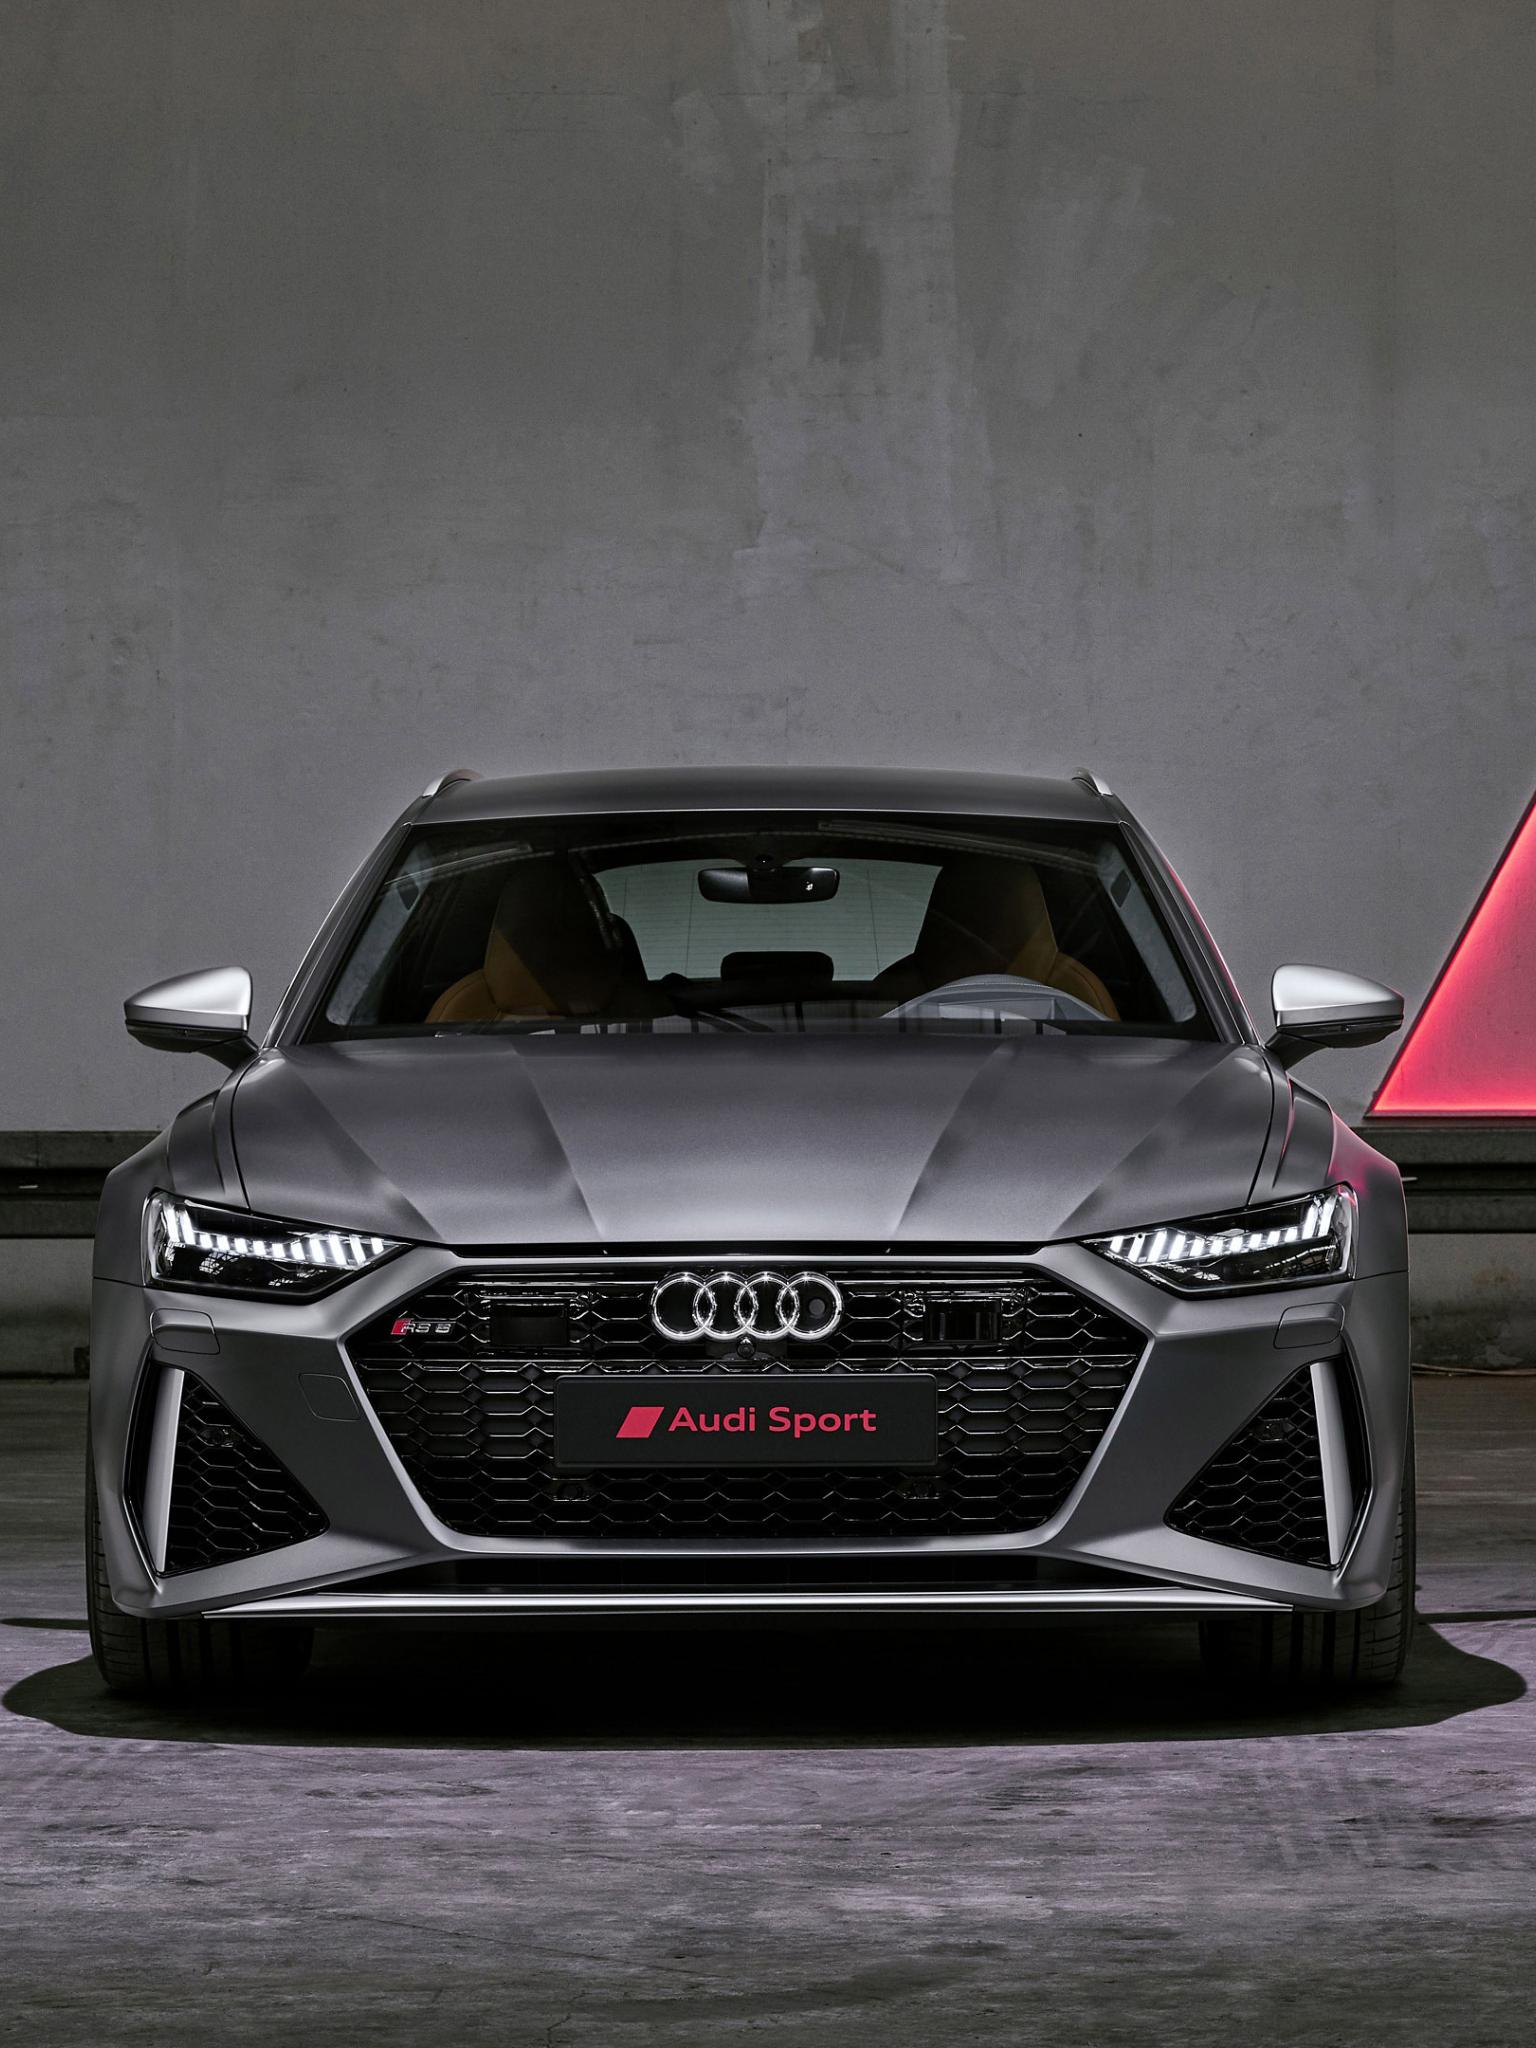 Free Download 2020 Audi Rs6 Avant 4k 2 Wallpaper Hd Car Wallpapers Id 13060 3840x2160 For Your Desktop Mobile Tablet Explore 45 Iphone 4k 2020 Wallpapers 4k 2020 Iphone